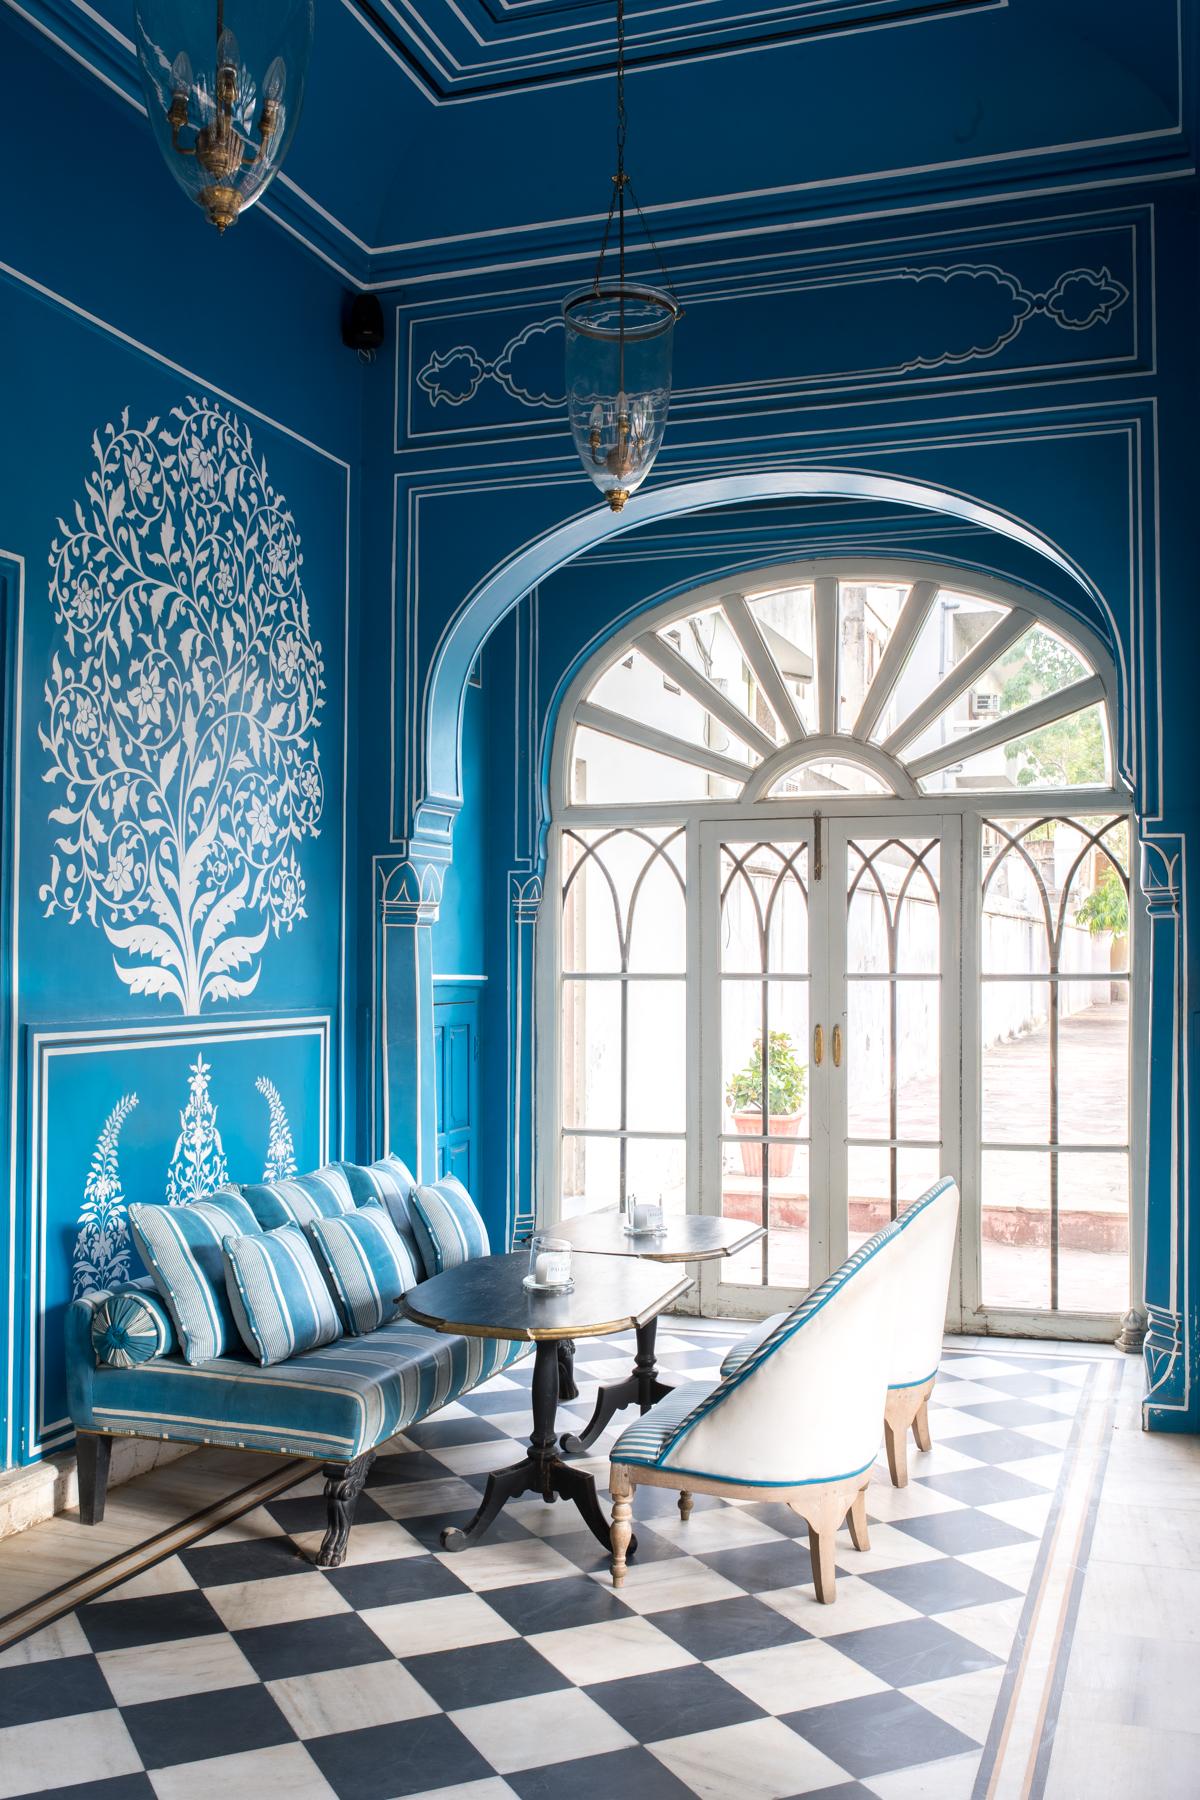 Interiors I Love Bar Palladio In Jaipur Stacie Flinner